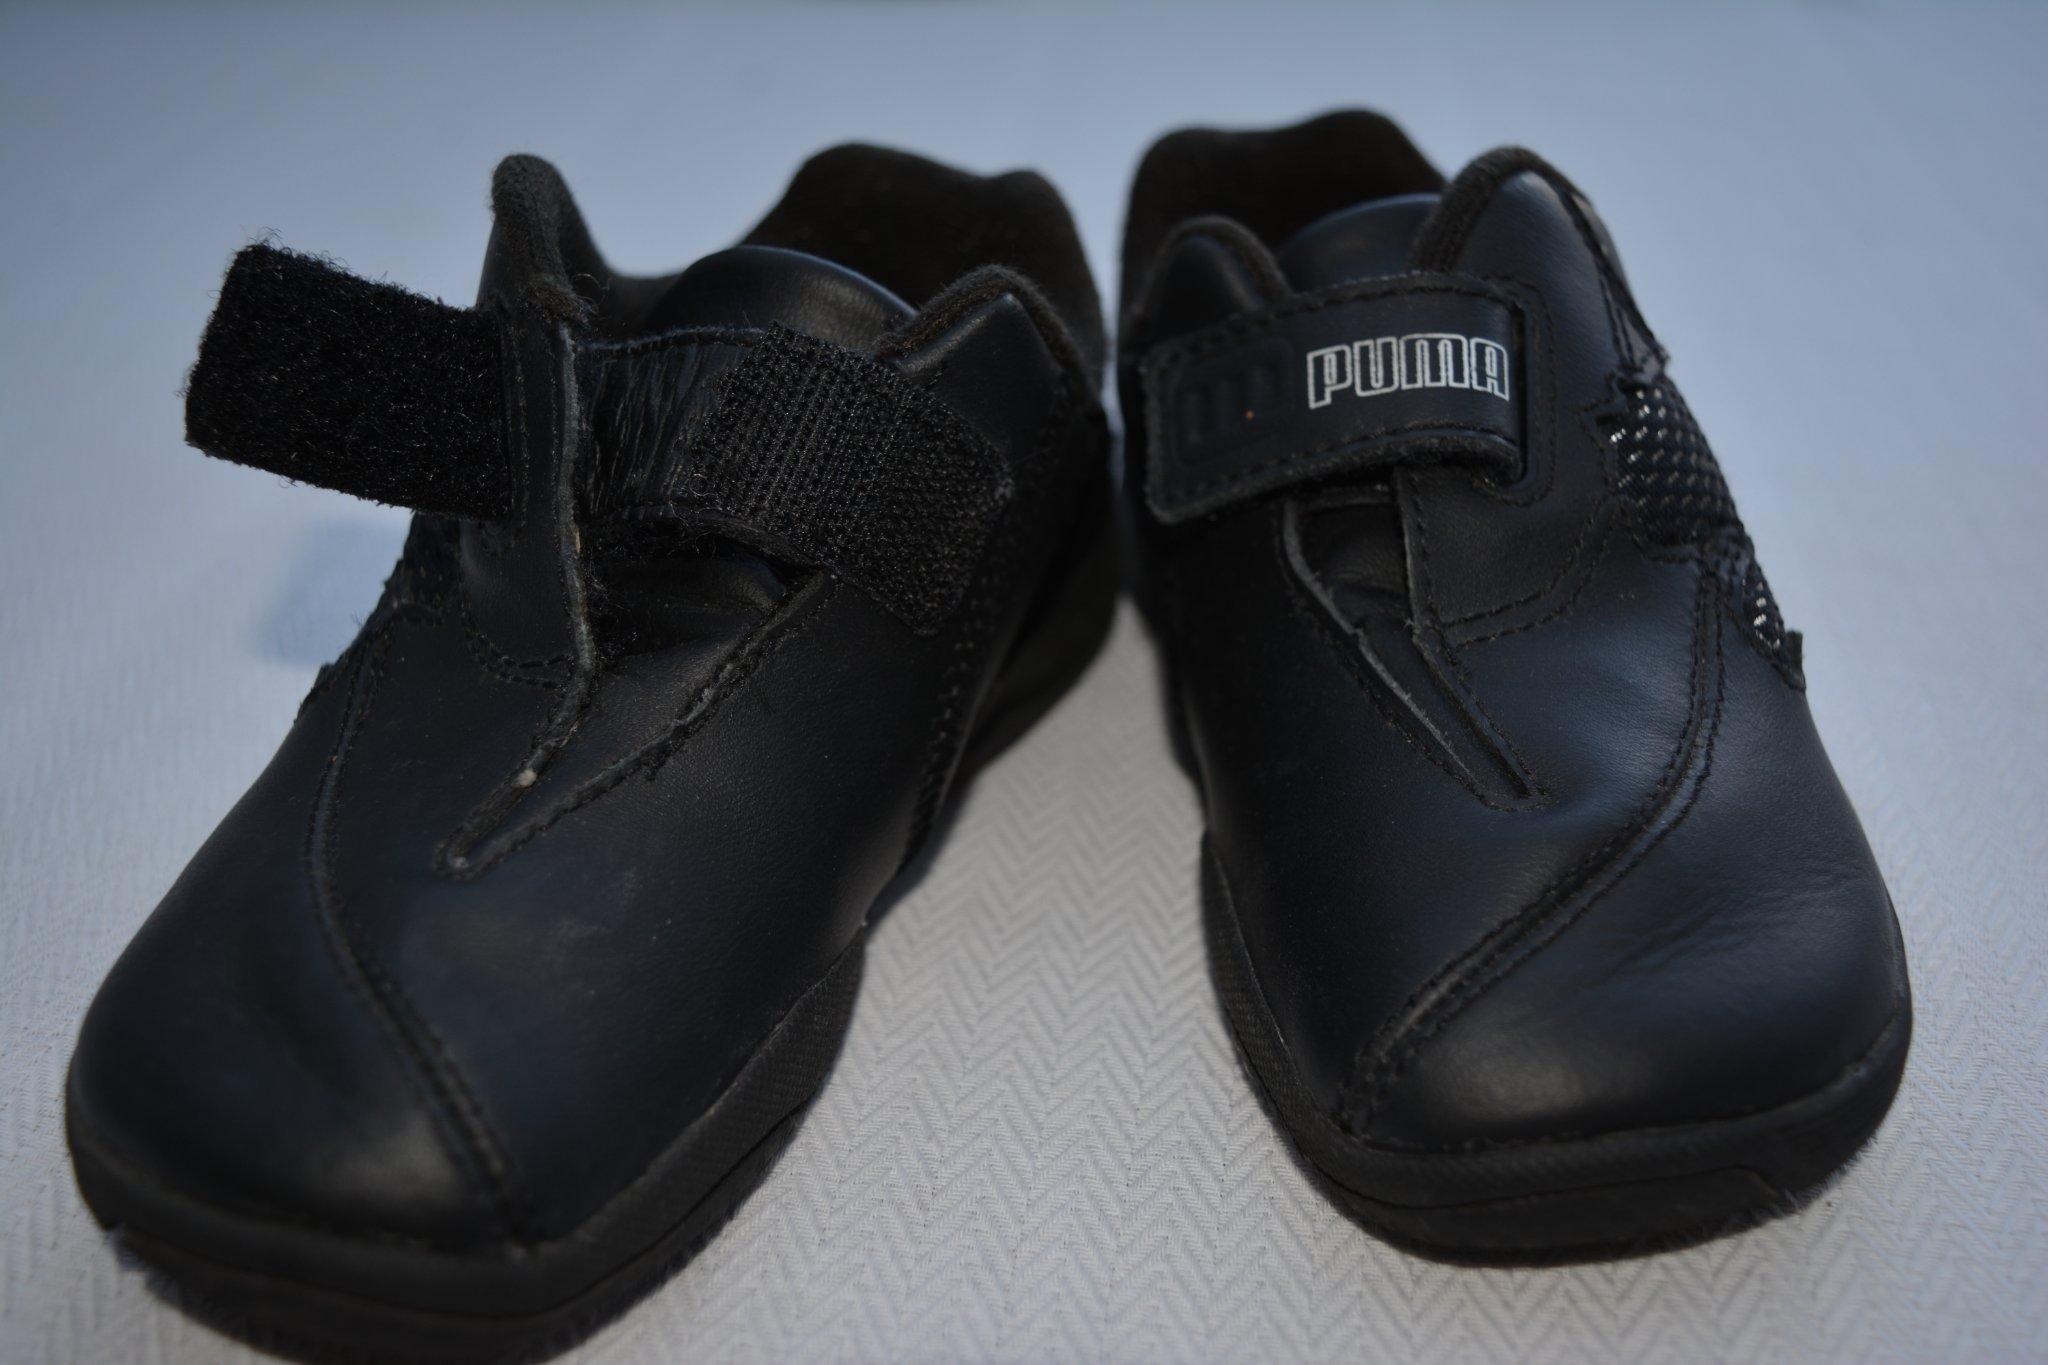 4a2472da91a Snygga svarta skor / tennisskor / sneakers - PUMA , storlek:24 , TOPPSKICK  ...